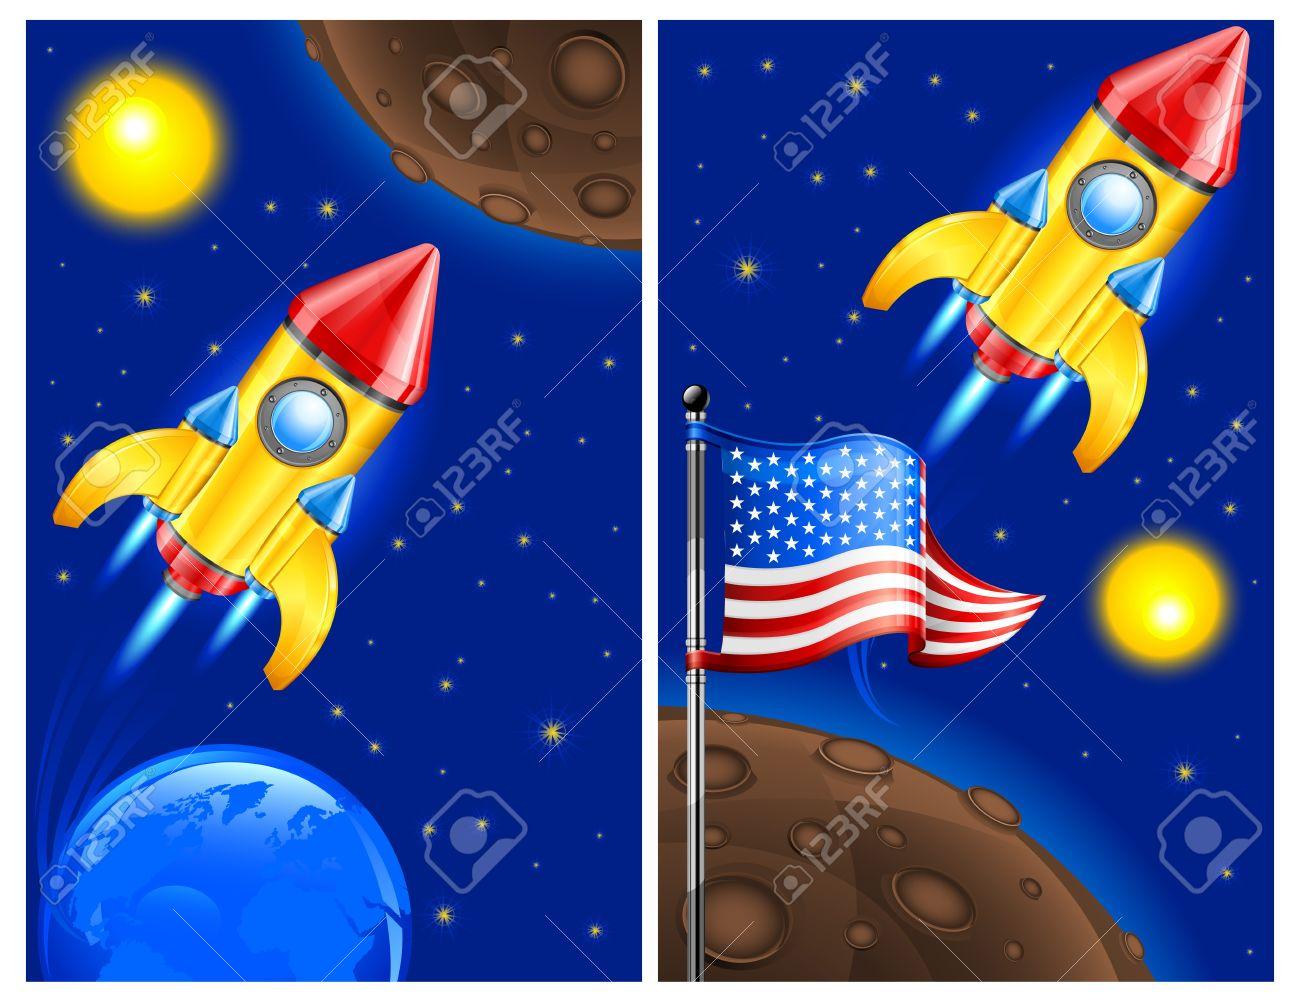 American retro rocket ship space vehicle blasting off into sky, vector illustration. Stock Vector - 12829511